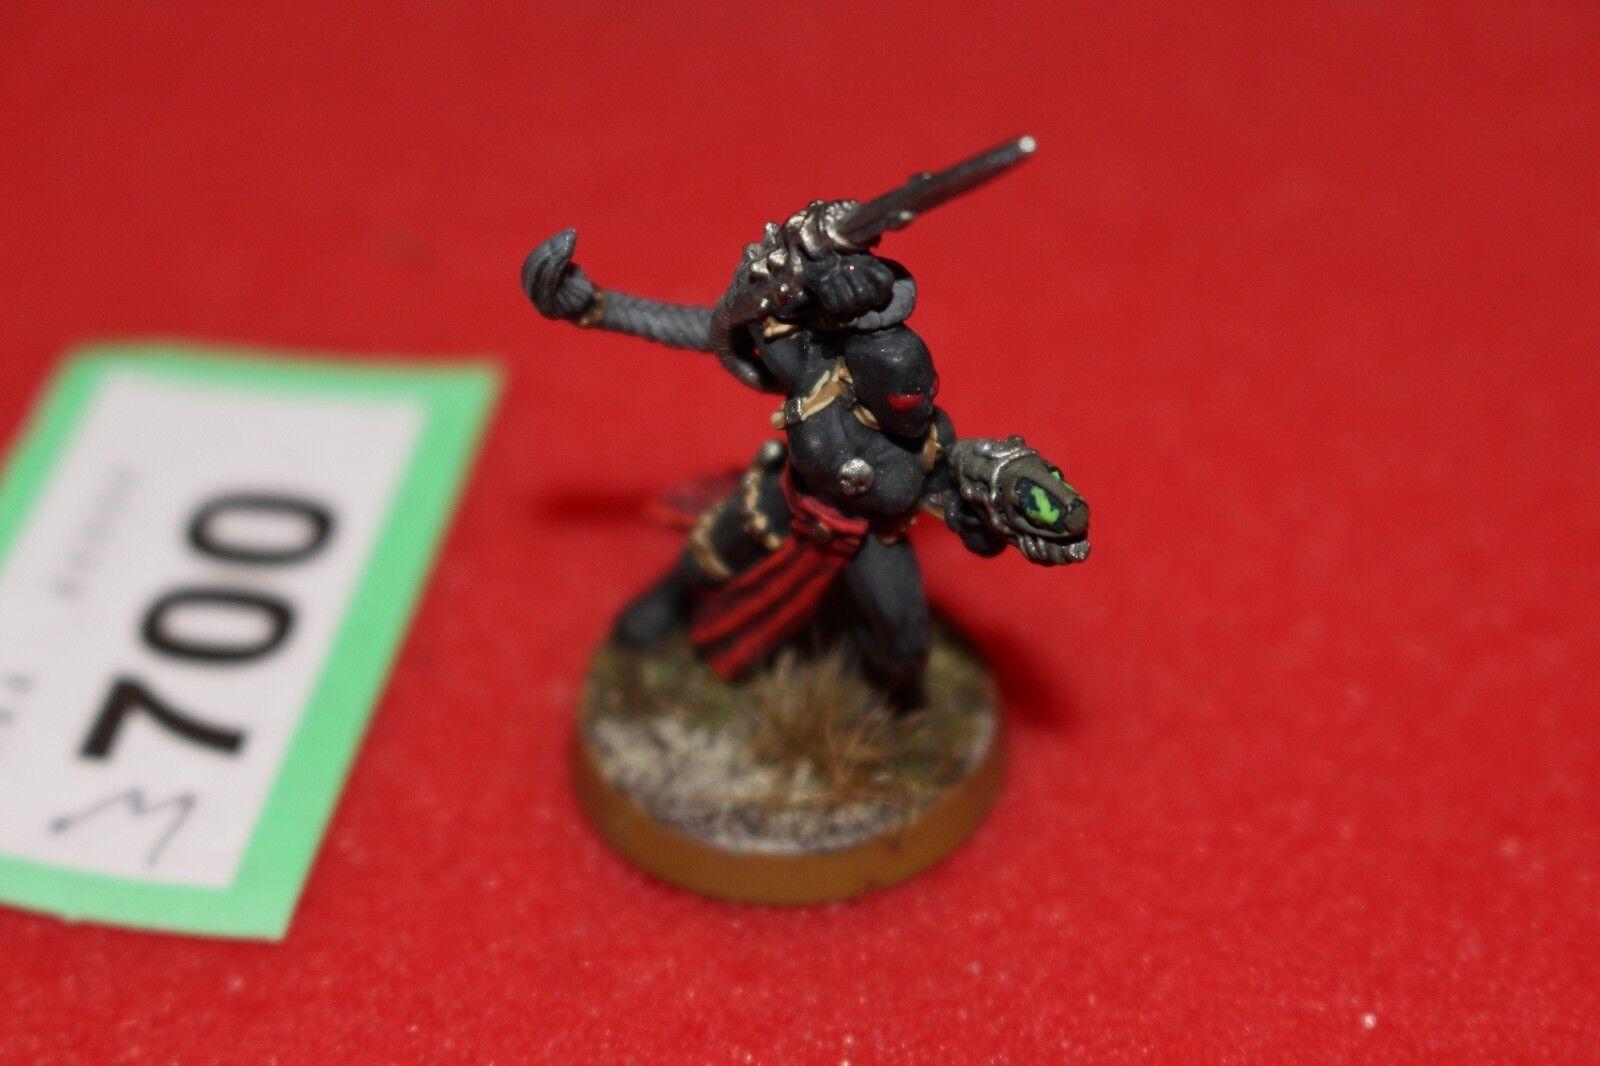 Games Workshop Warhammer 40k Callidus Assassin Pro Painted Metal Figure WH40K